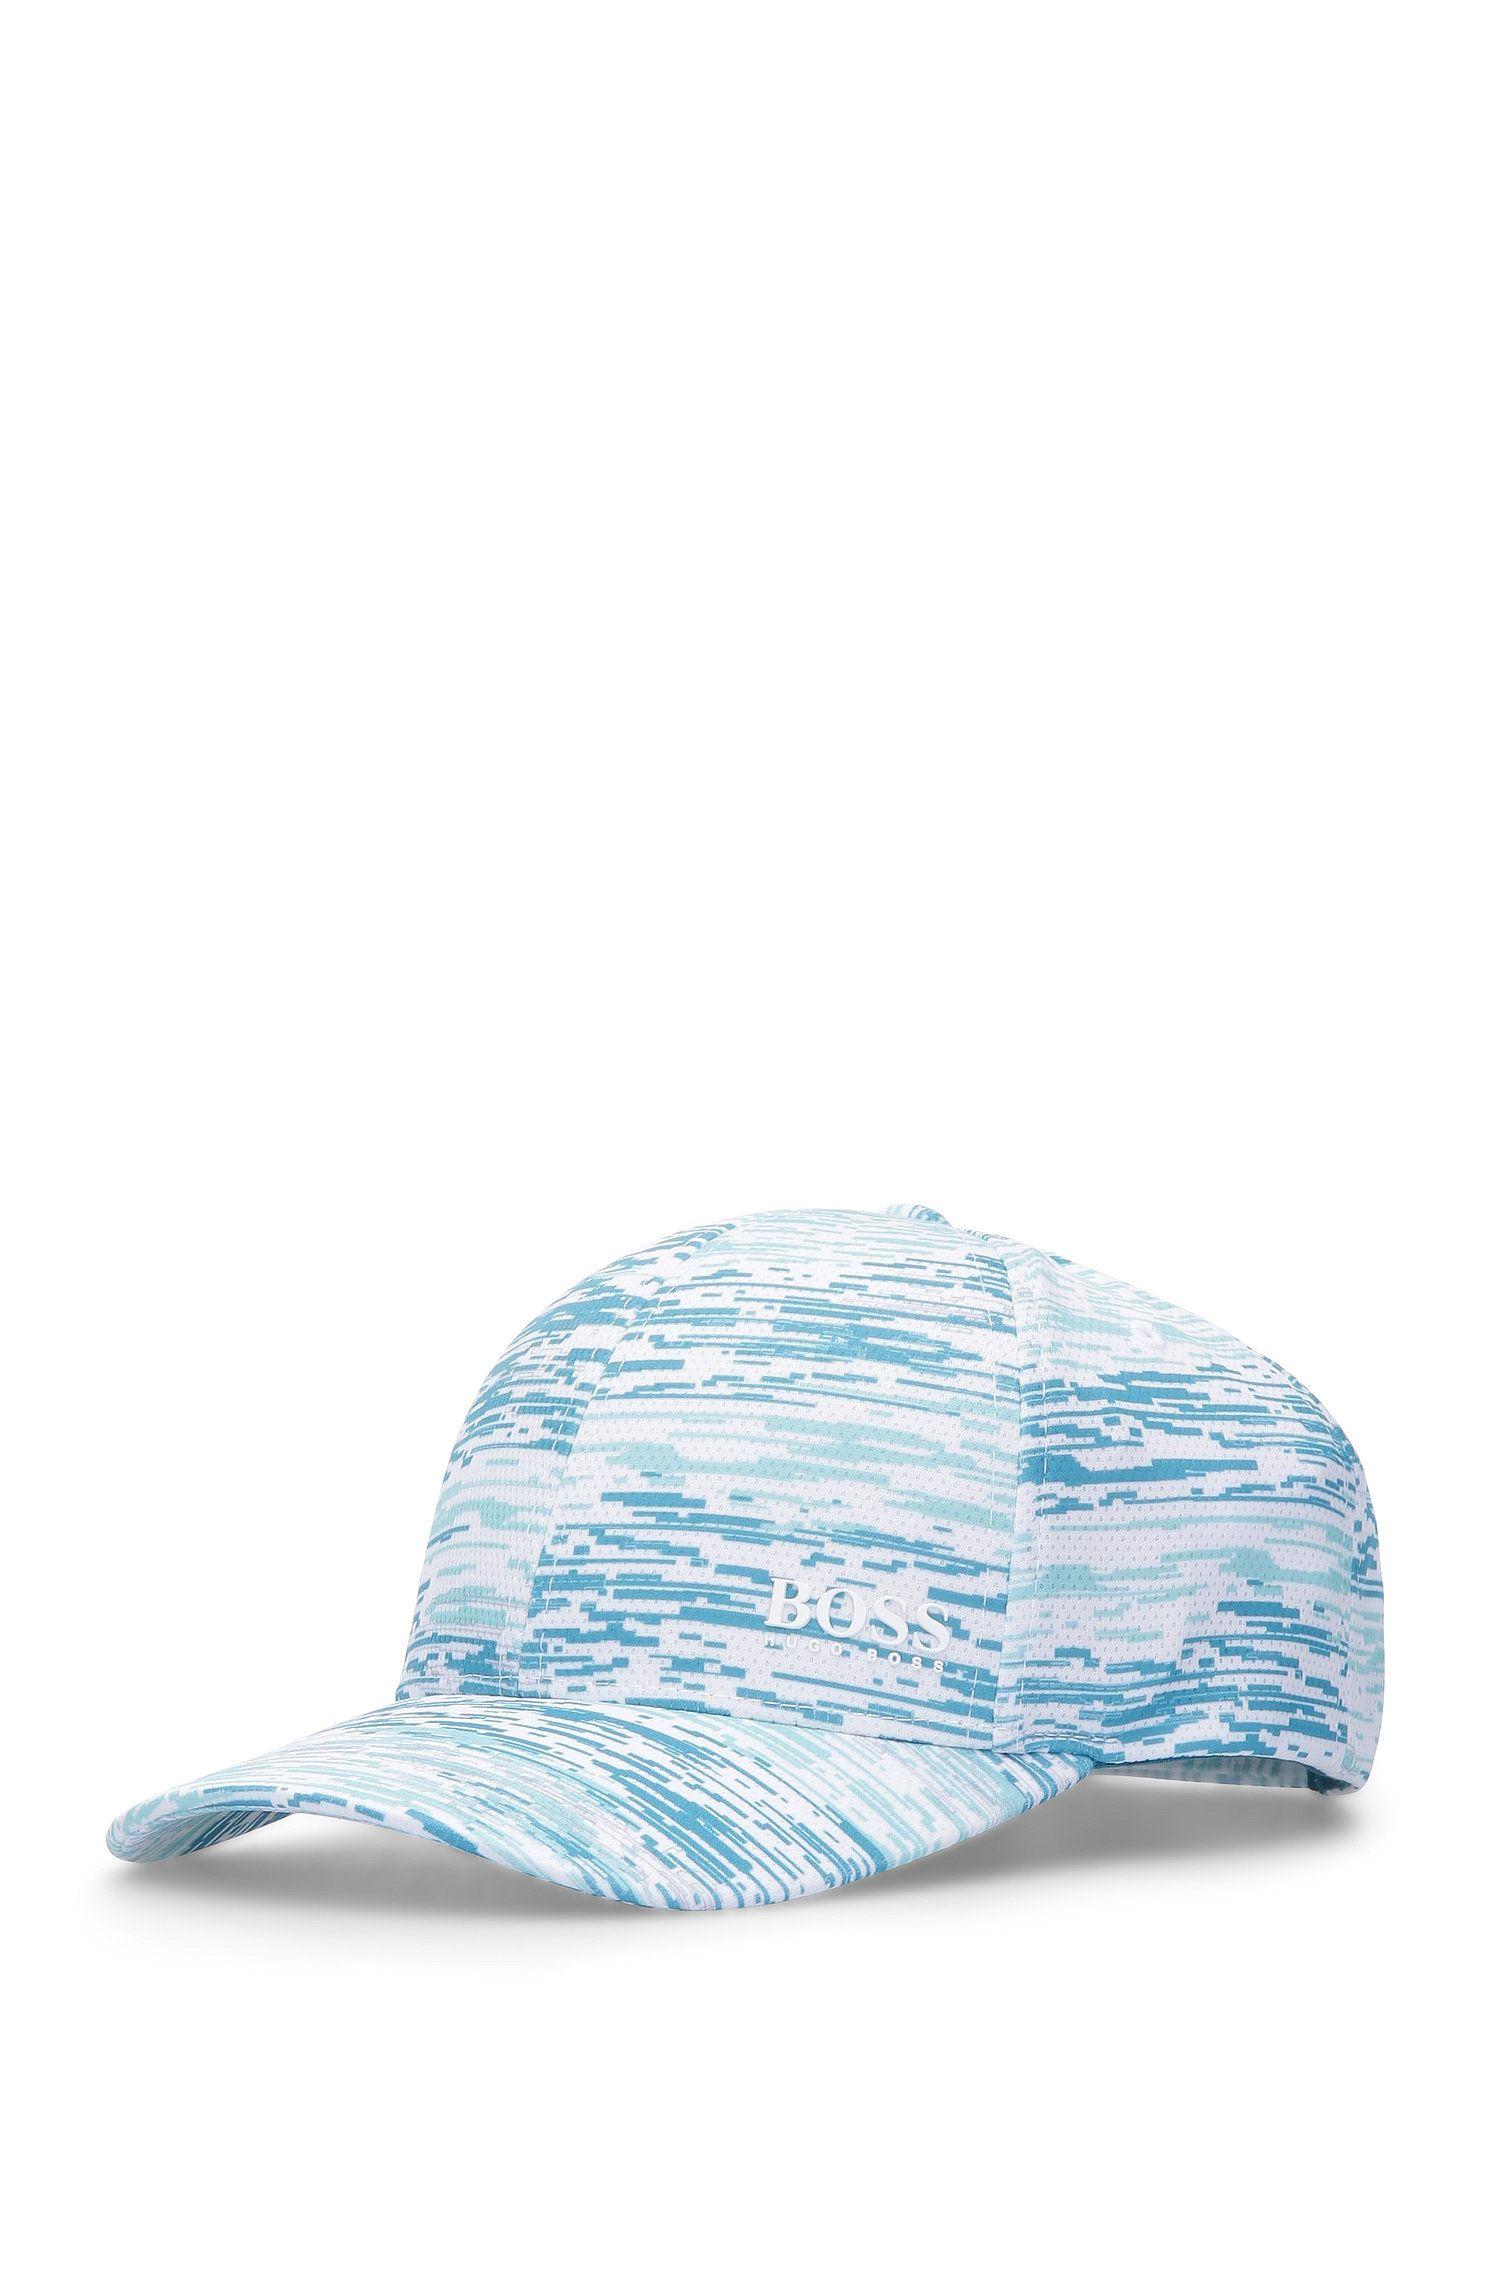 Baseball Cap with Pattern | Printcap